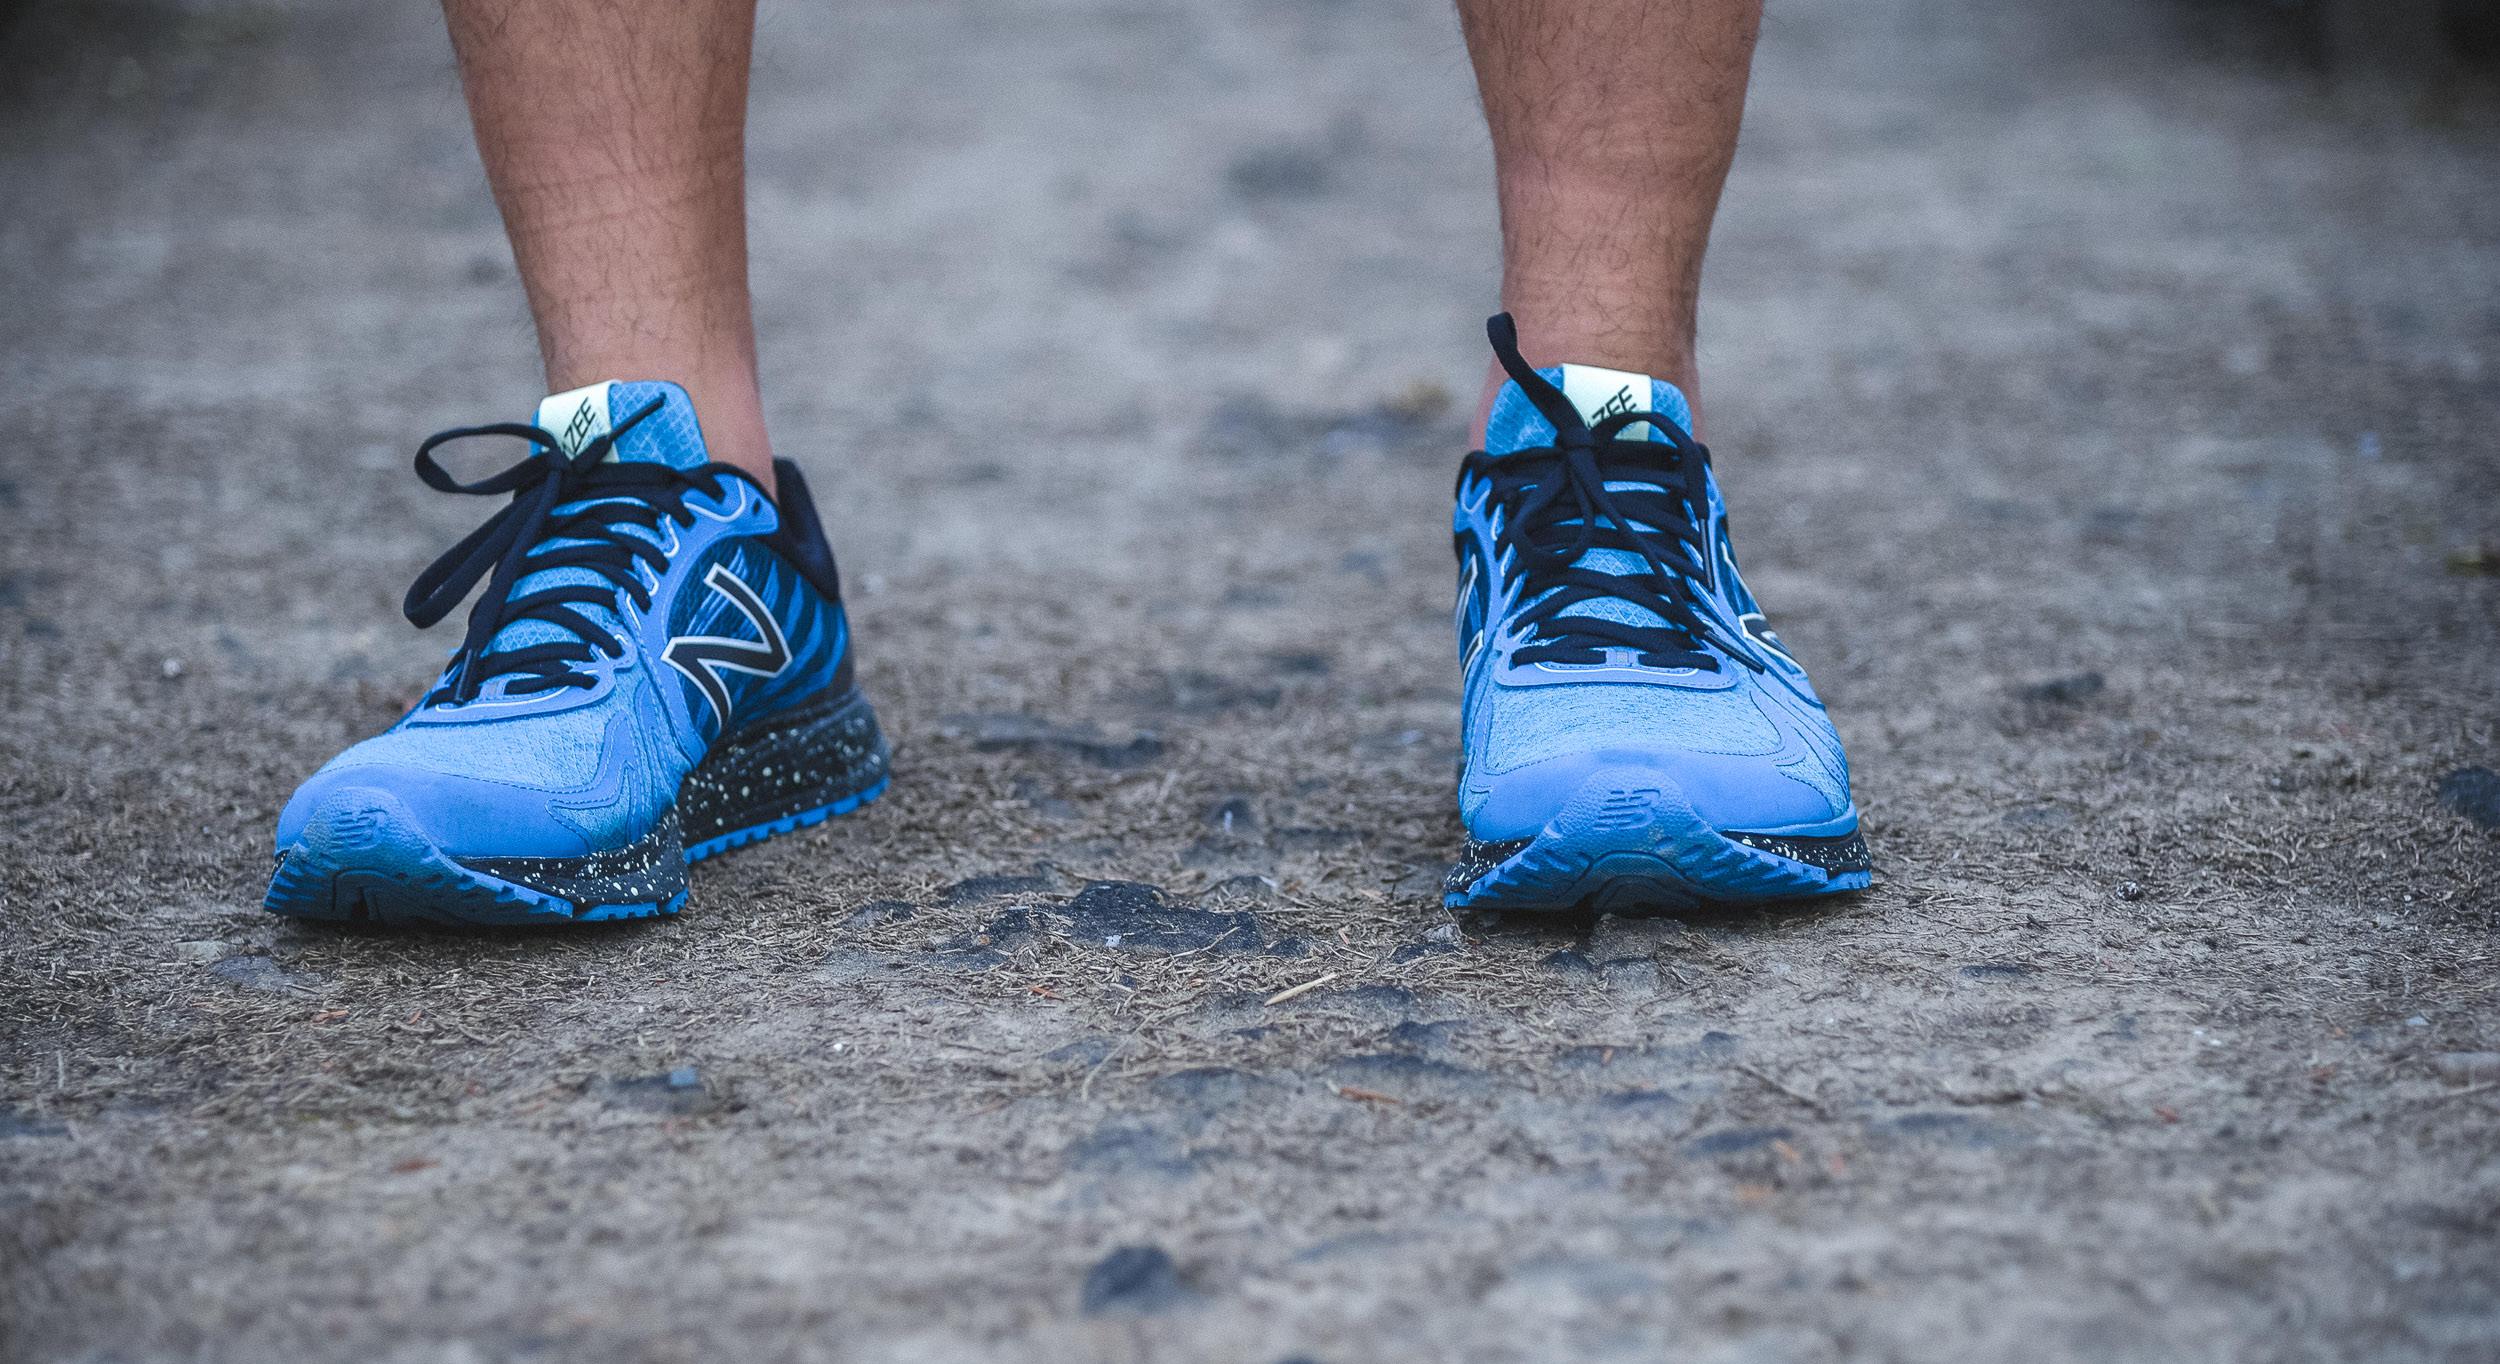 跑鞋 | 夜空中最亮的星 New Balance Vazee Pace V2 Protect Pack评测